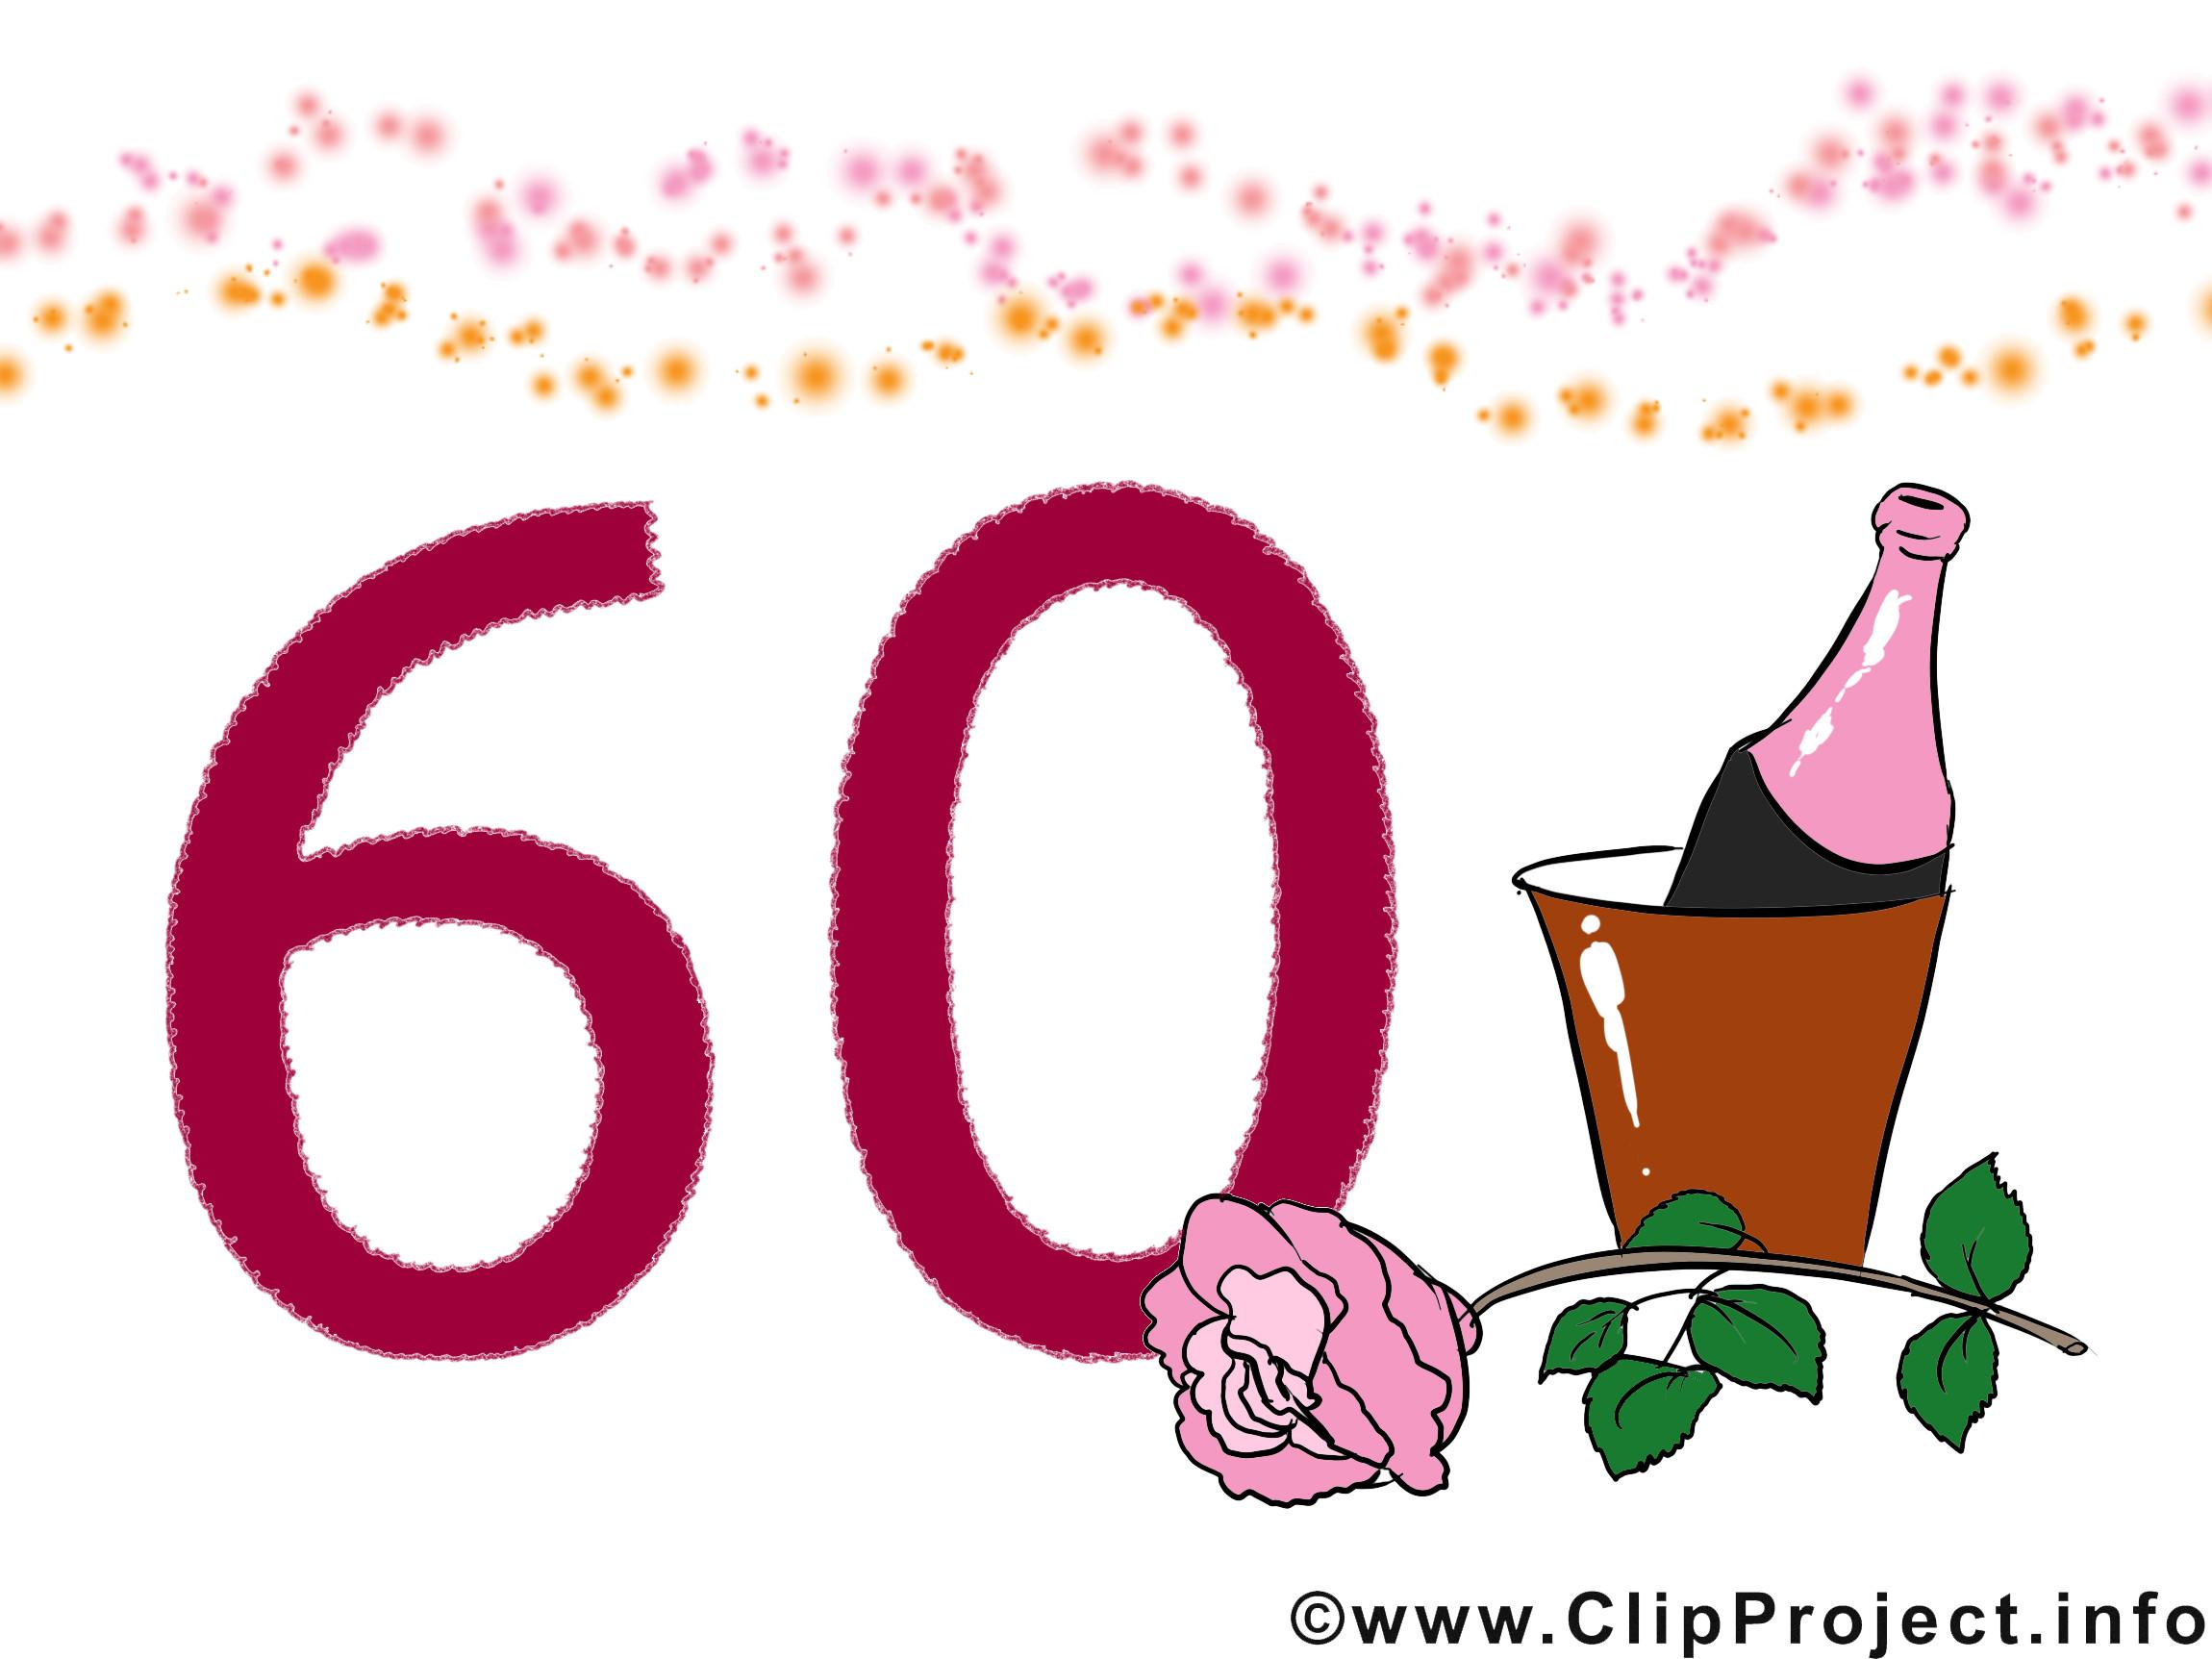 Geburtstagswünsche Zum 60  Geburtstagswünsche zum 60 Glückwunschkarte Clipart Bild